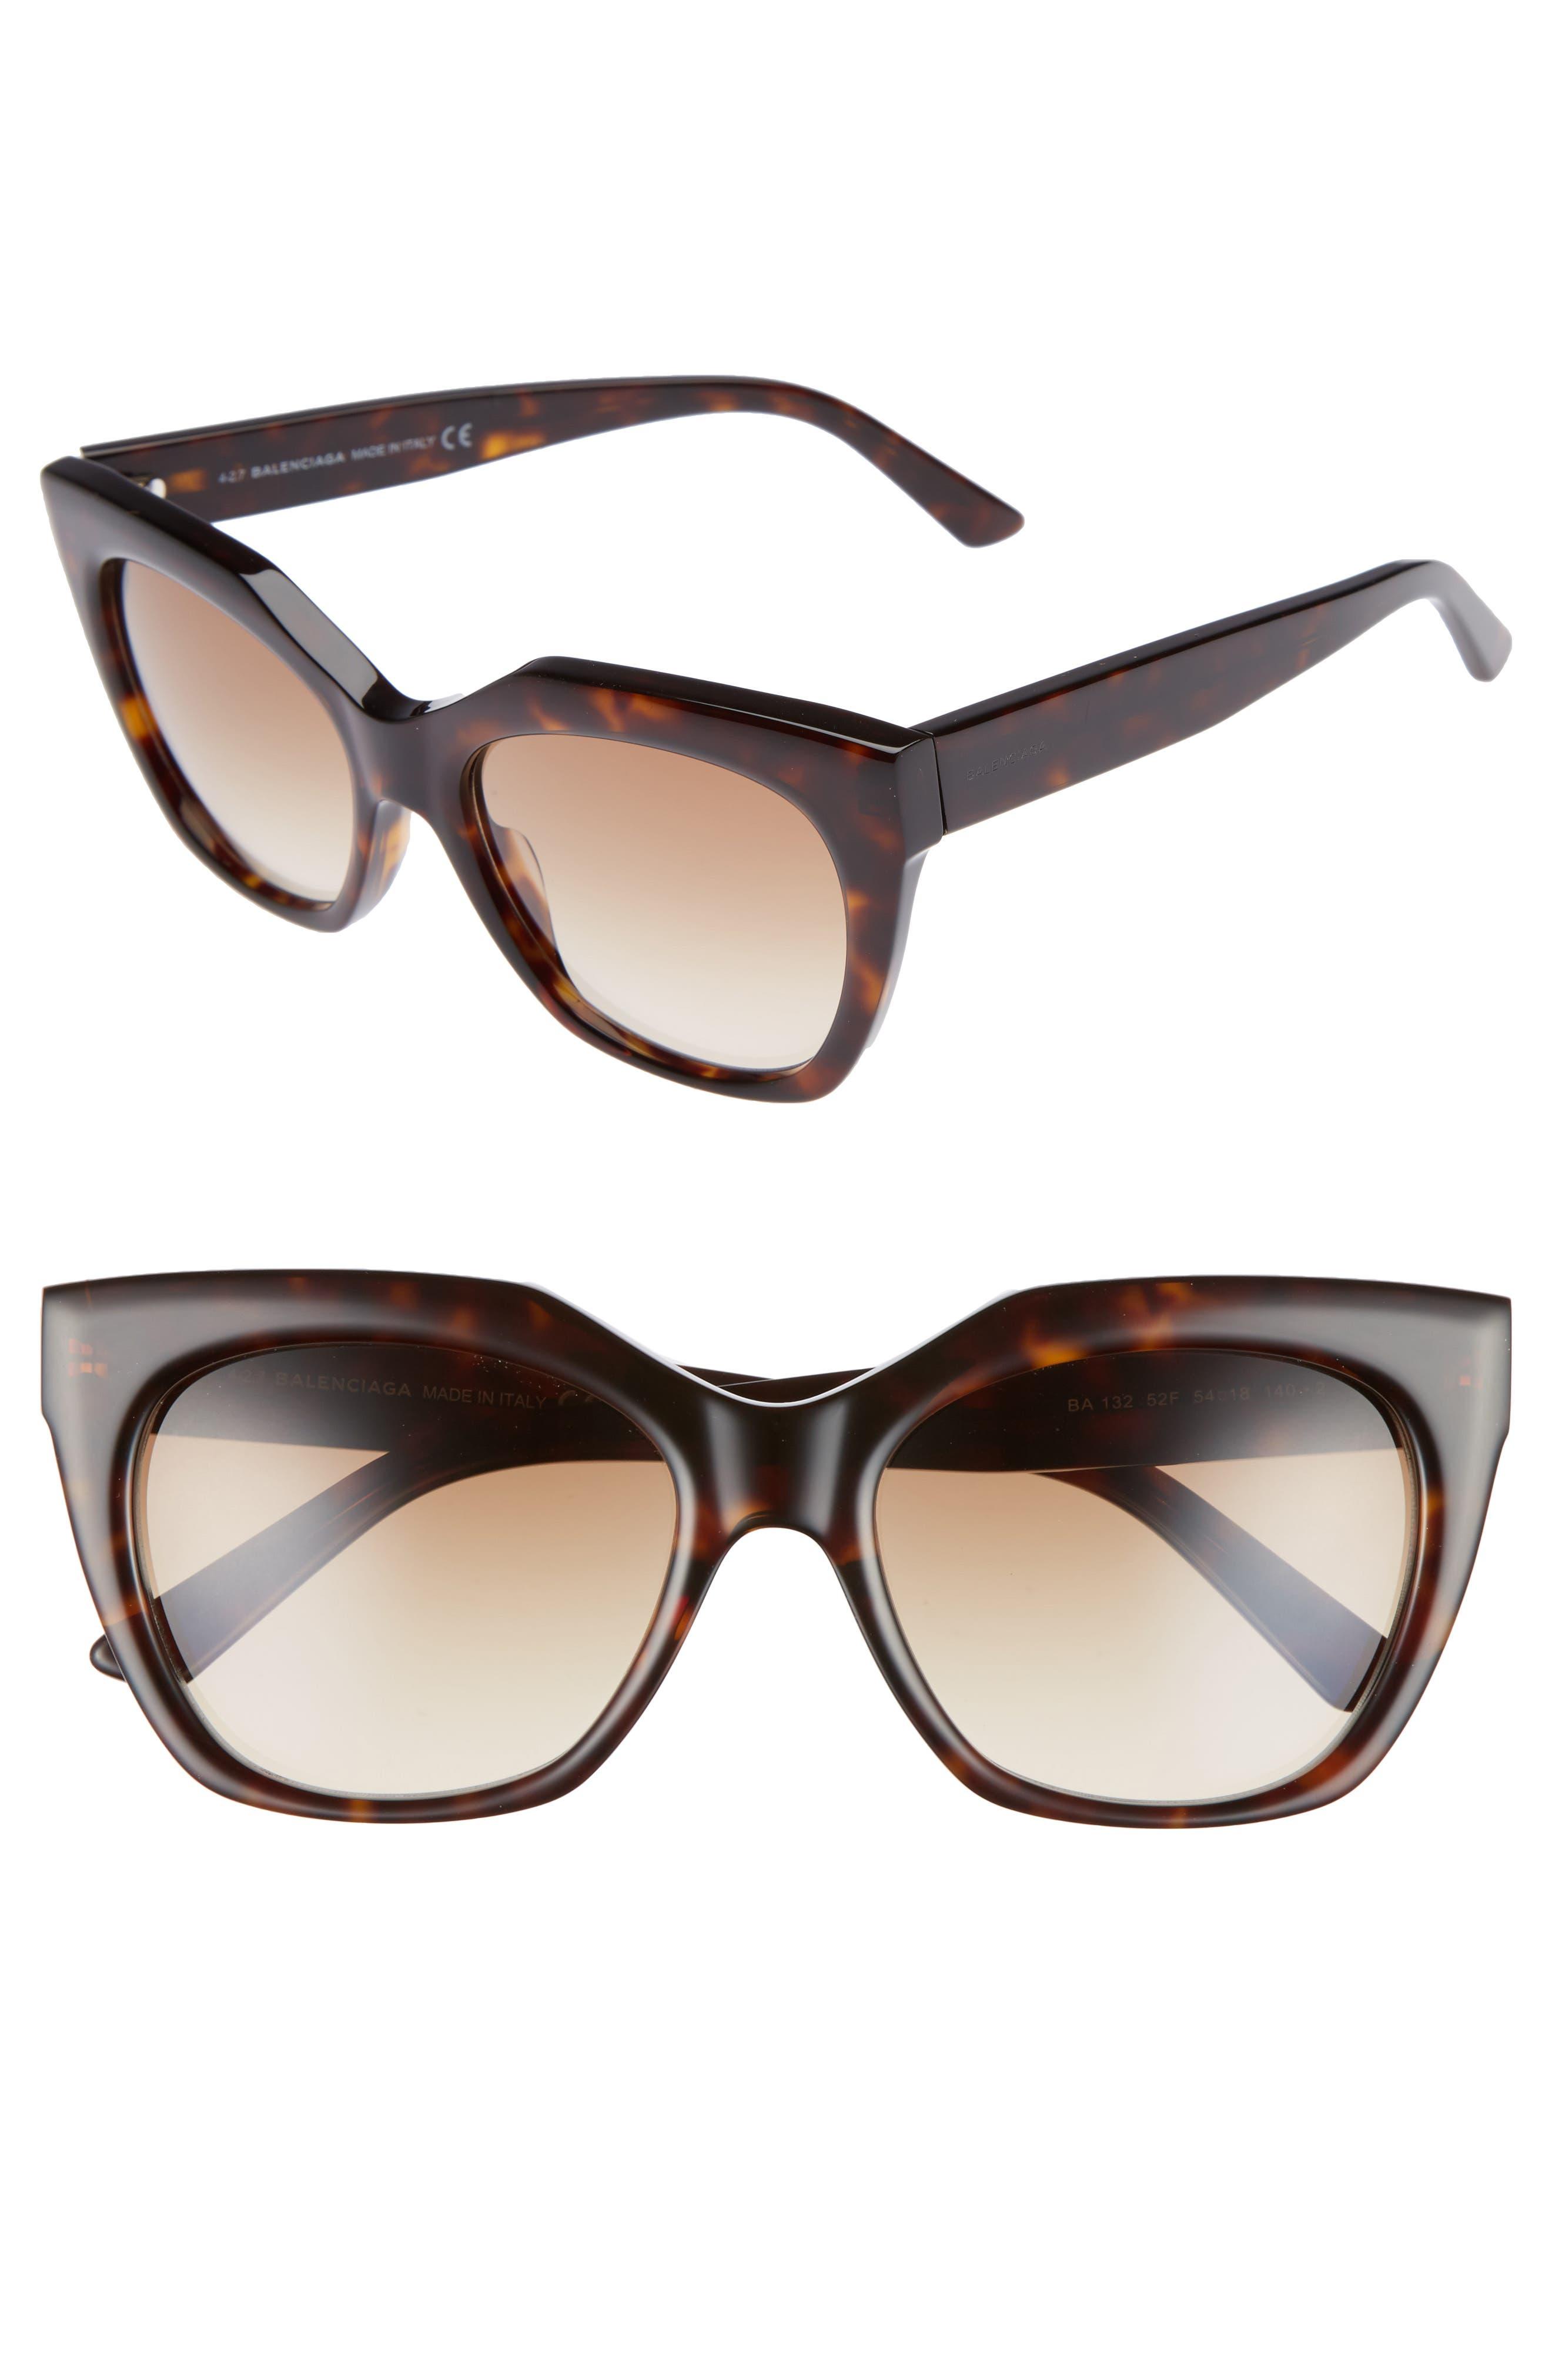 54mm Cat Eye Sunglasses,                         Main,                         color, DARK HAVANA/ GRADIENT BROWN